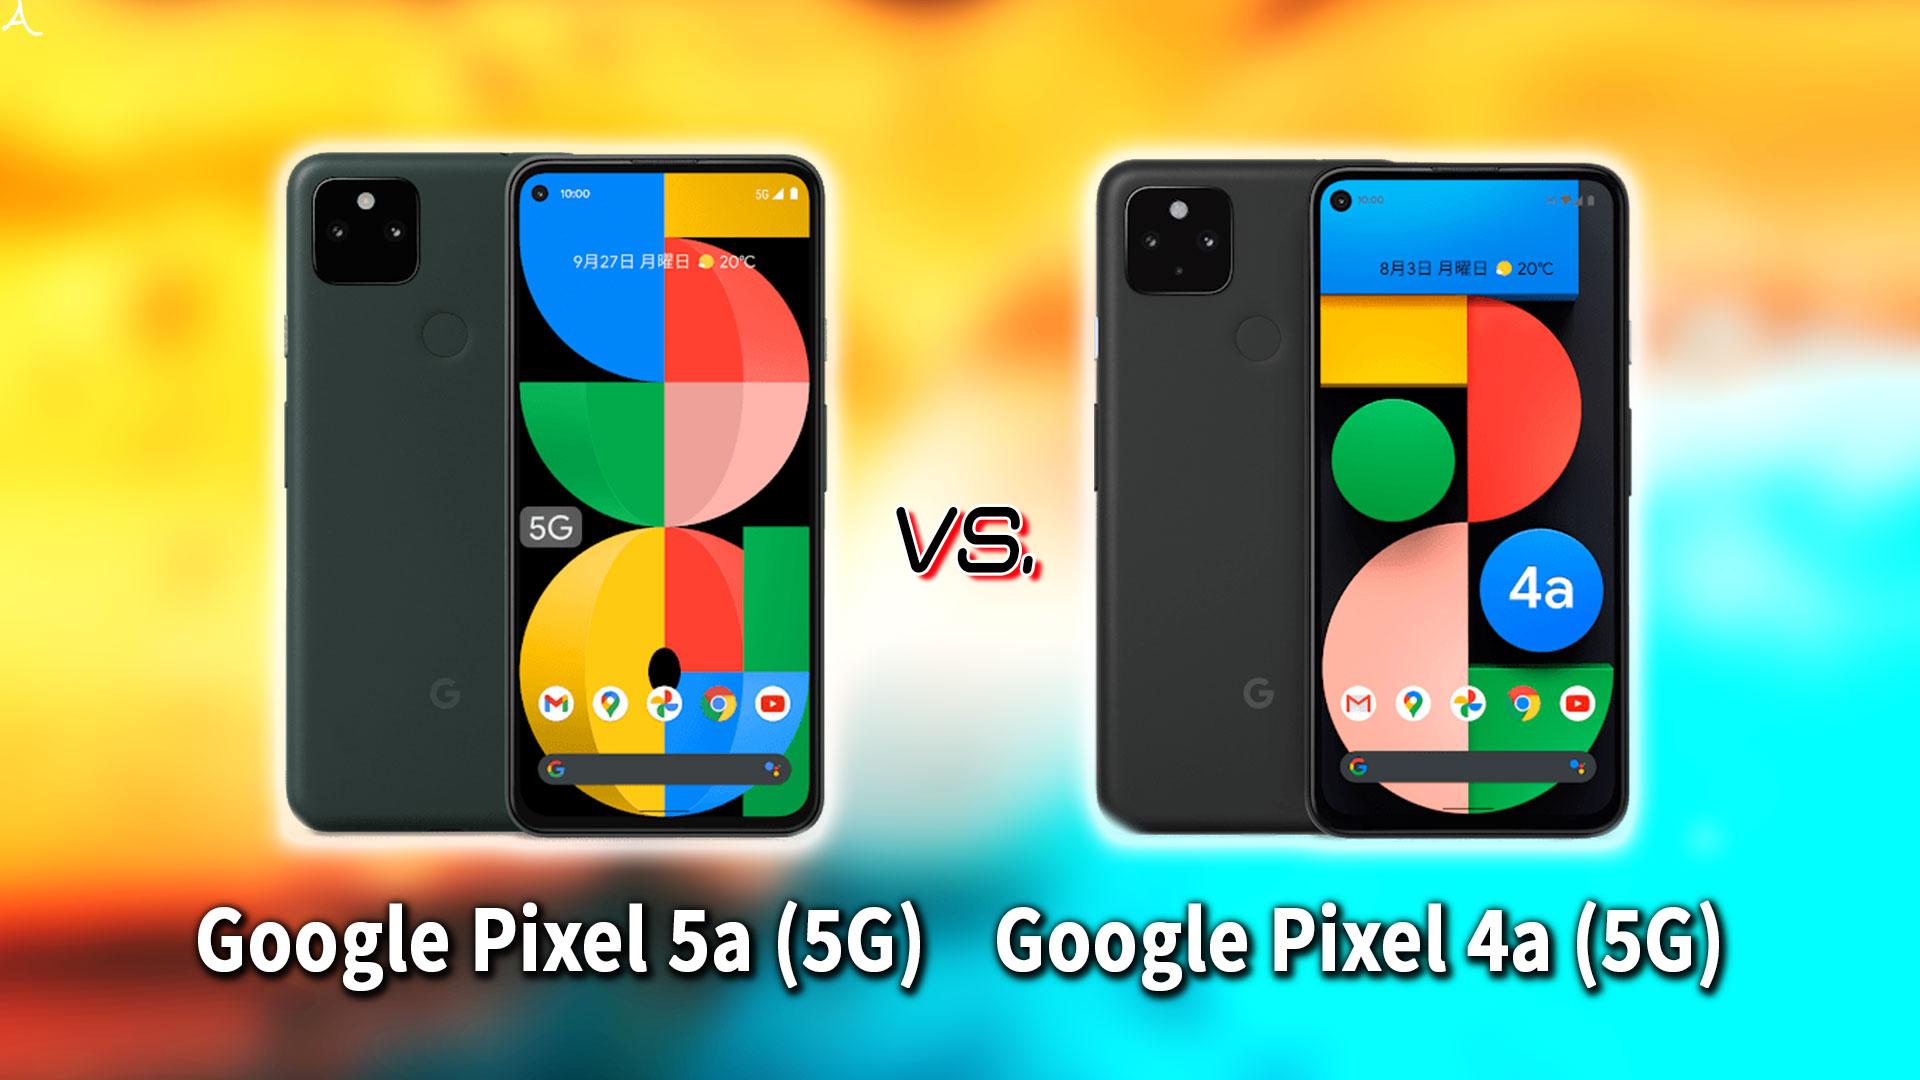 「Google Pixel 5a (5G)」と「Pixel 4a (5G)」の違いを比較:どっちを買う?